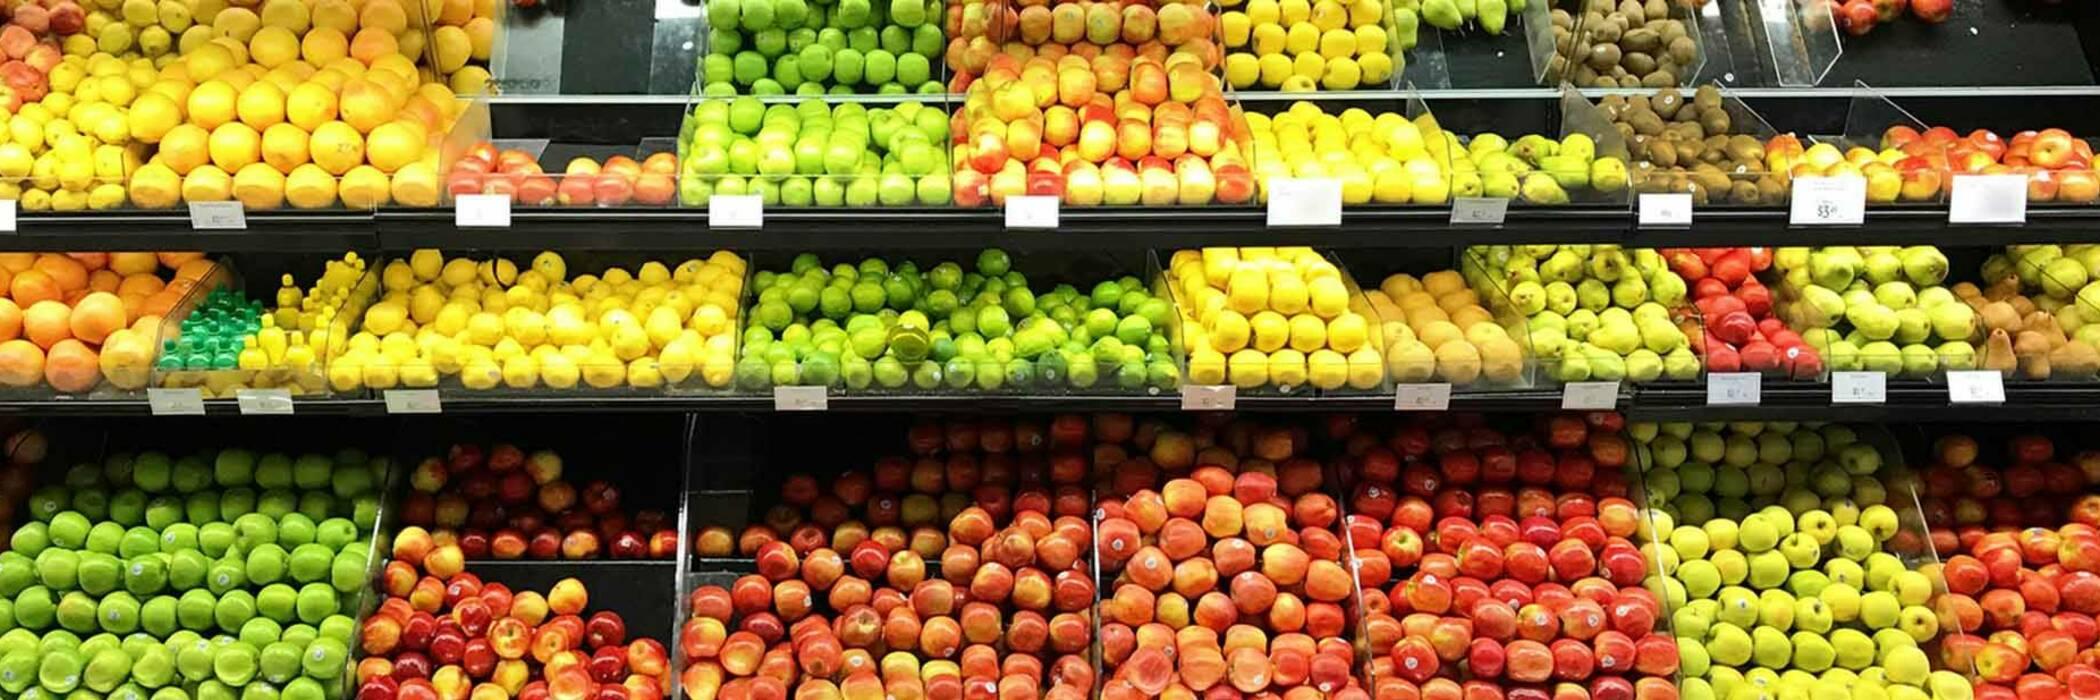 Grocery department in supermarket